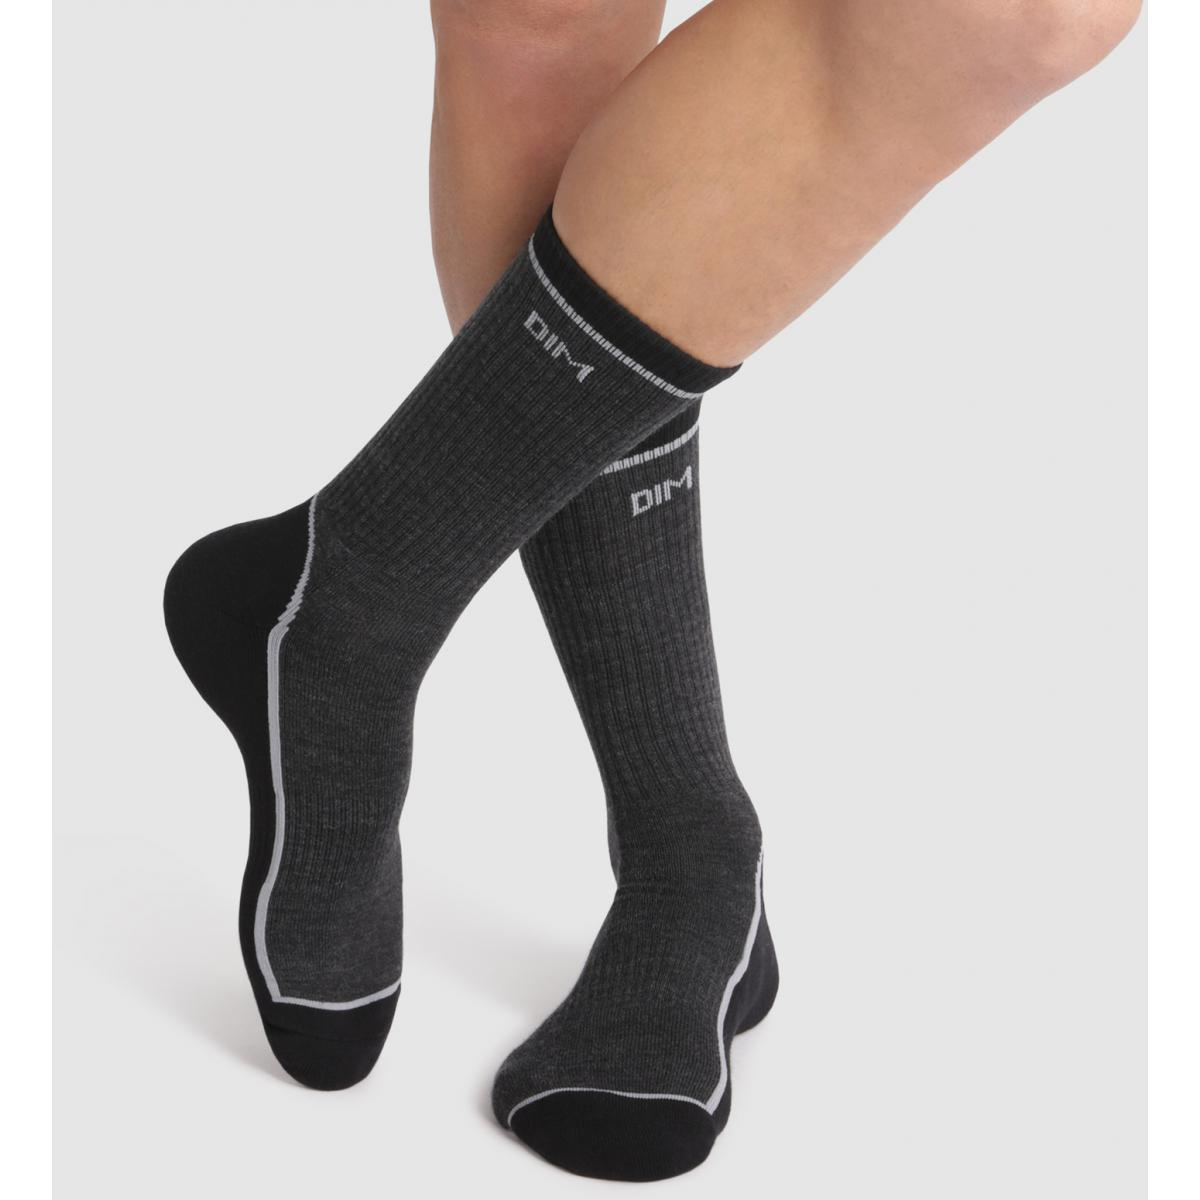 Chaussettes hautes outdoor - Gris - Dim Underwear - Modalova